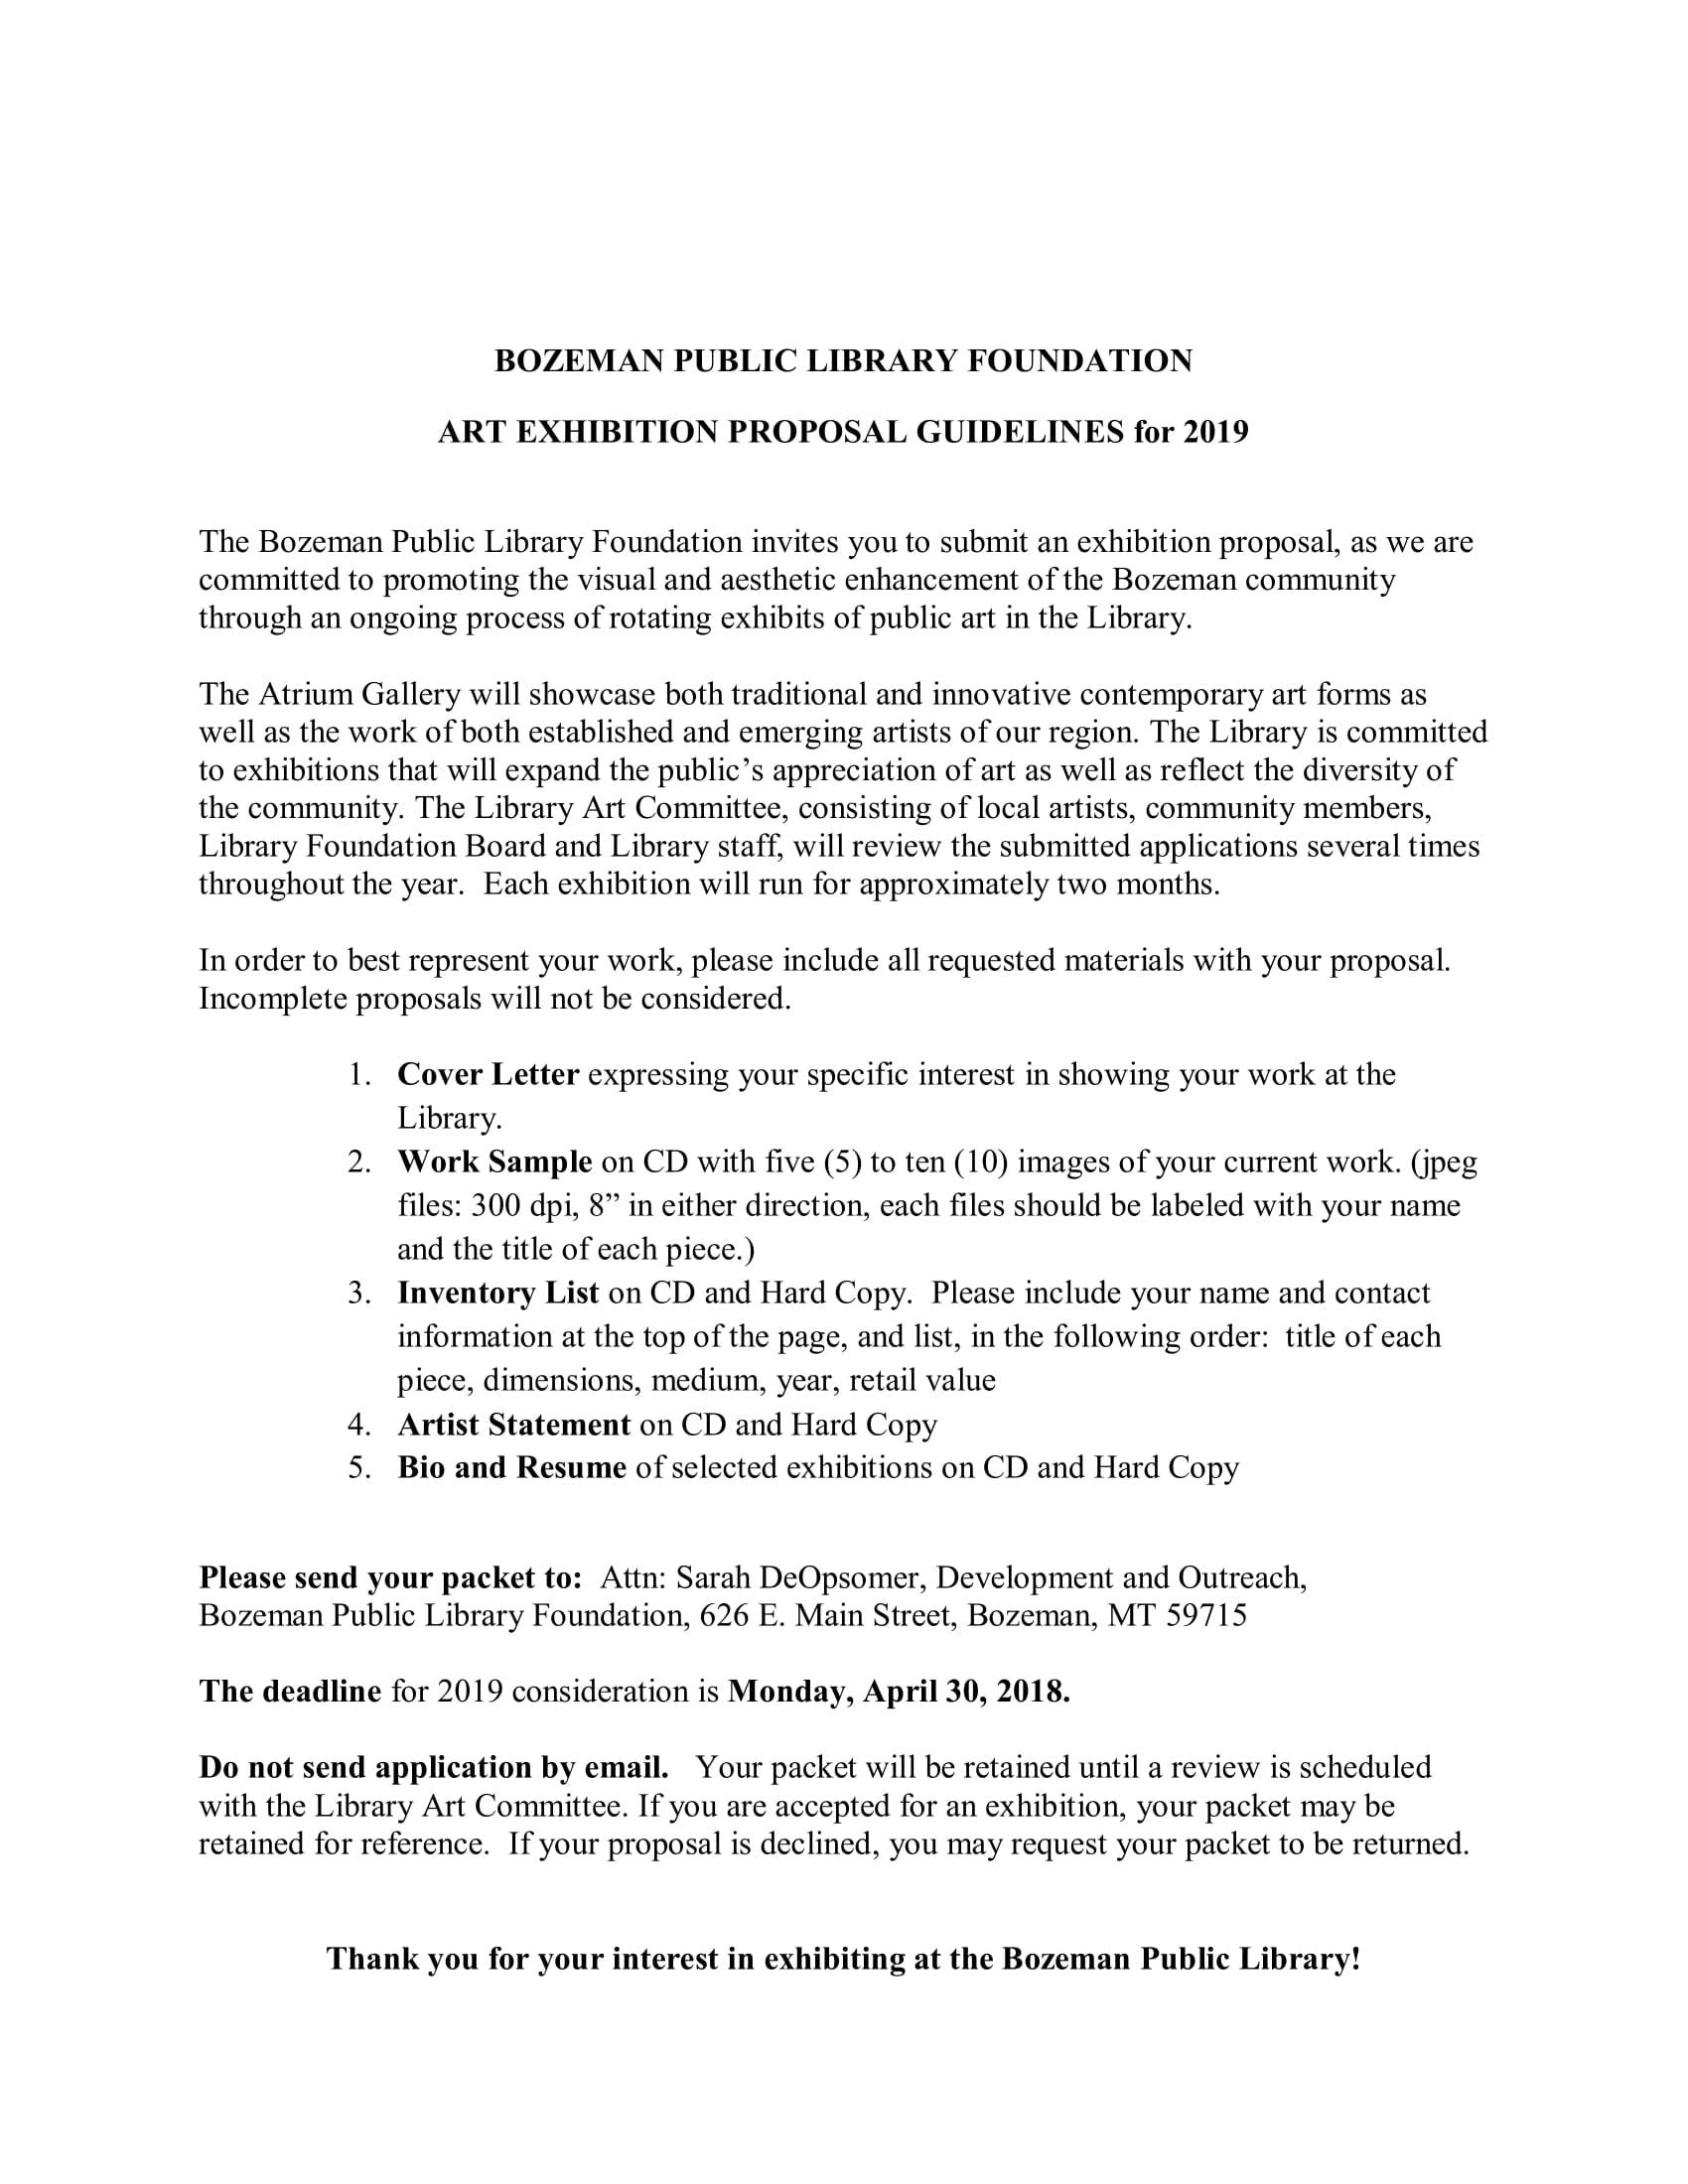 bplf exhibit proposal guide